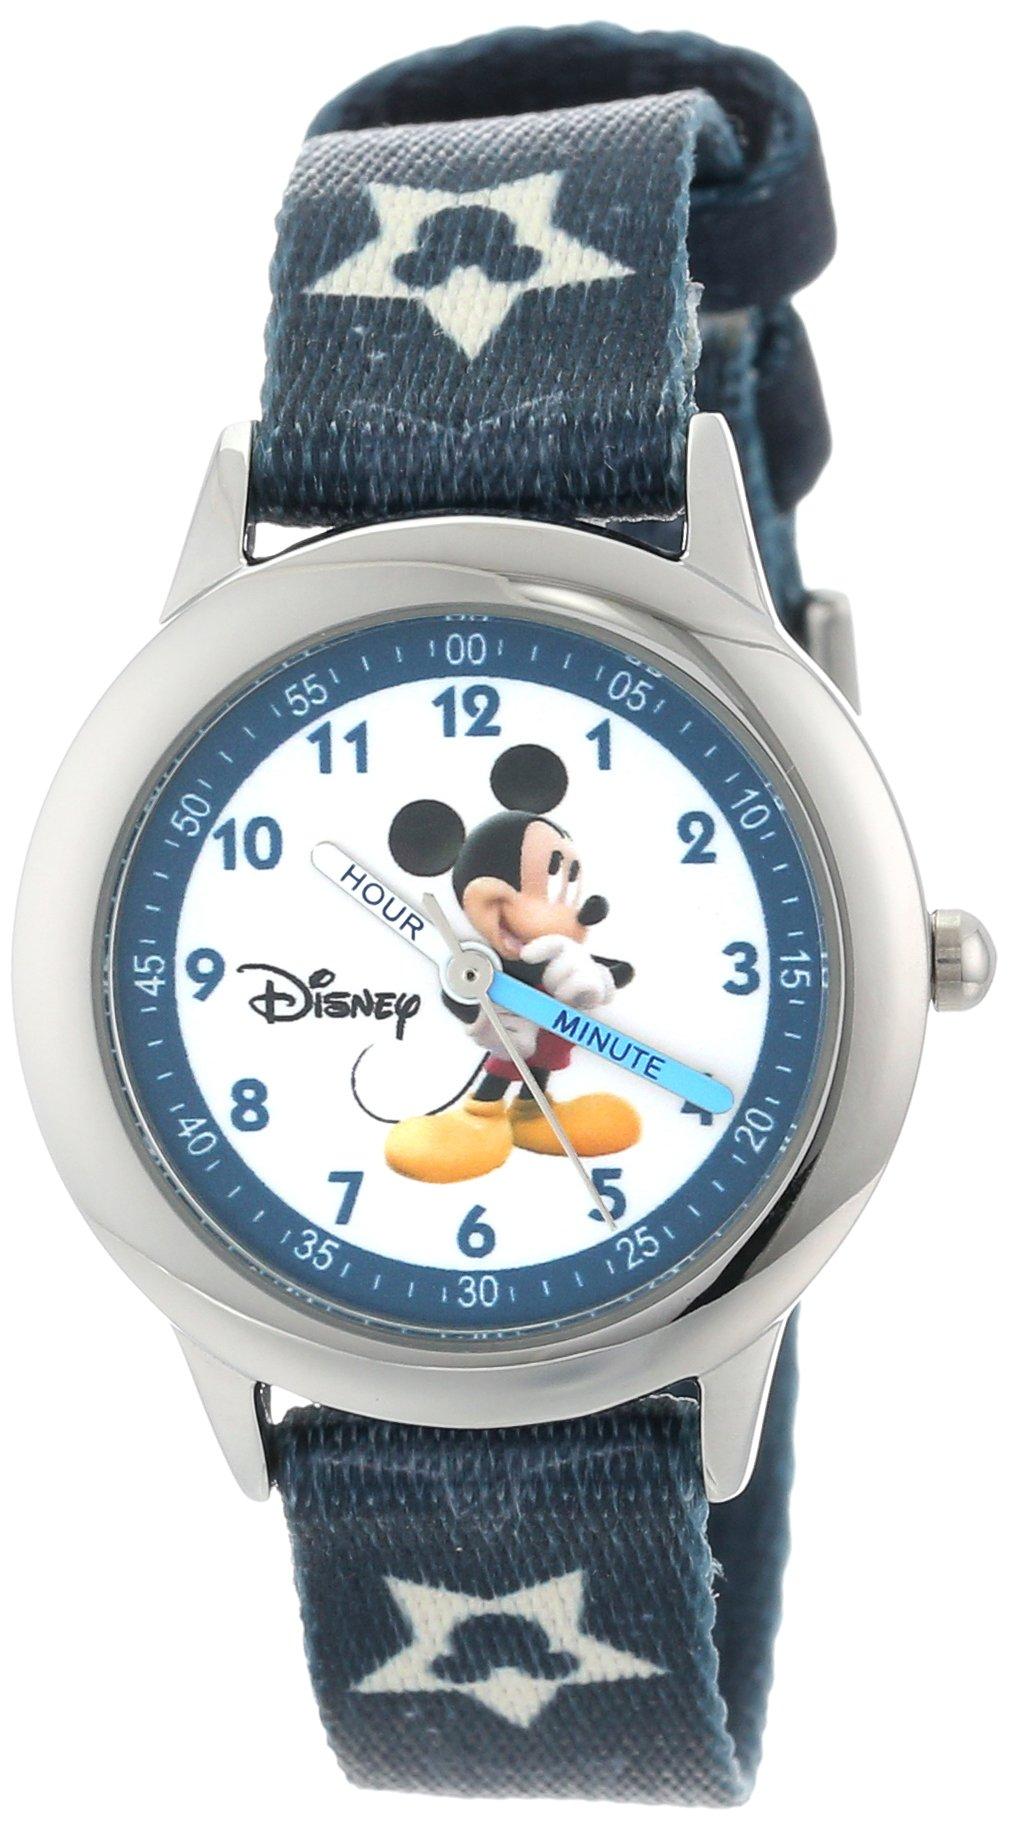 Disney Kids' W000015 Mickey Mouse Stainless Steel Time Teacher Watch by Disney